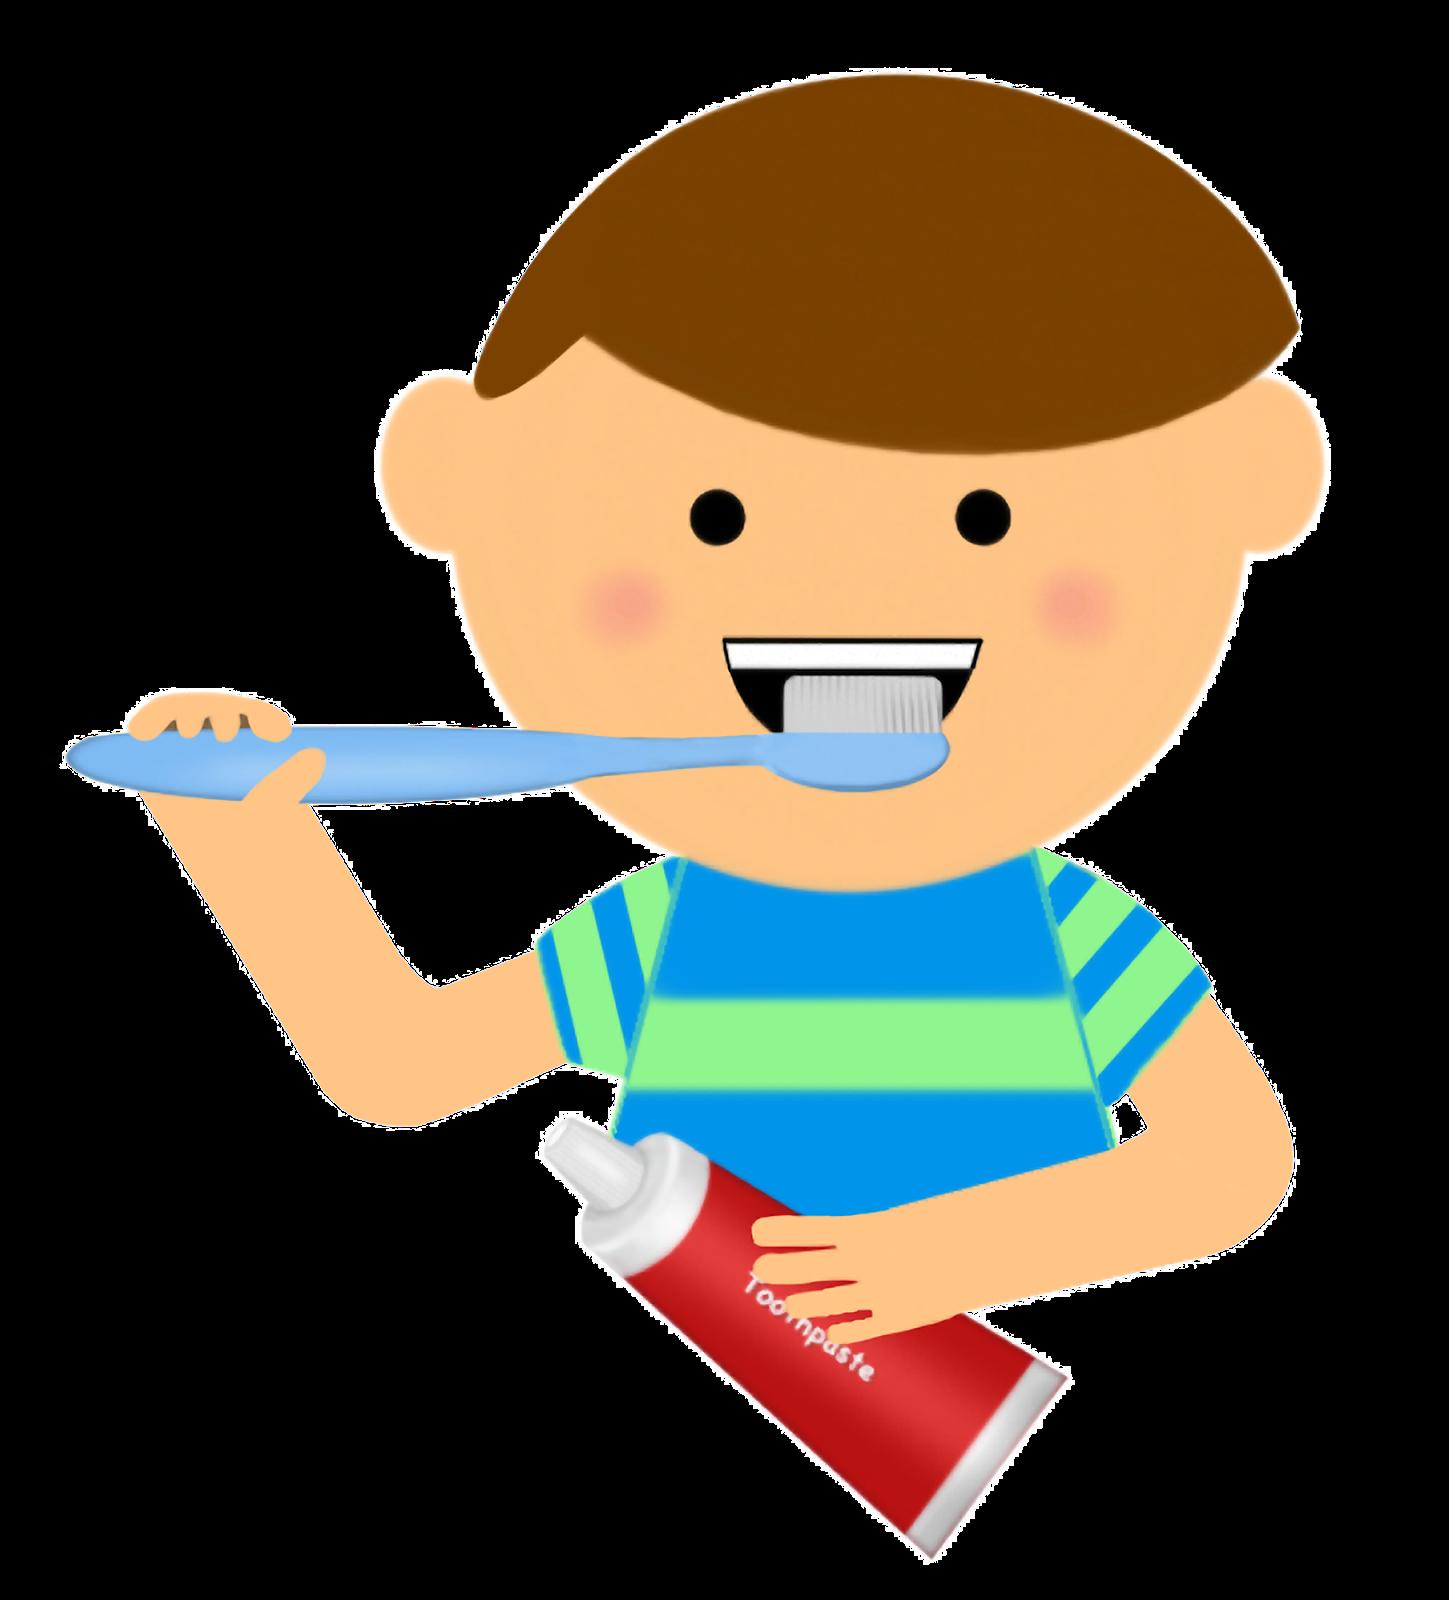 Precious Little Worlds Dental Oral Healt-Precious Little Worlds Dental Oral Health-16